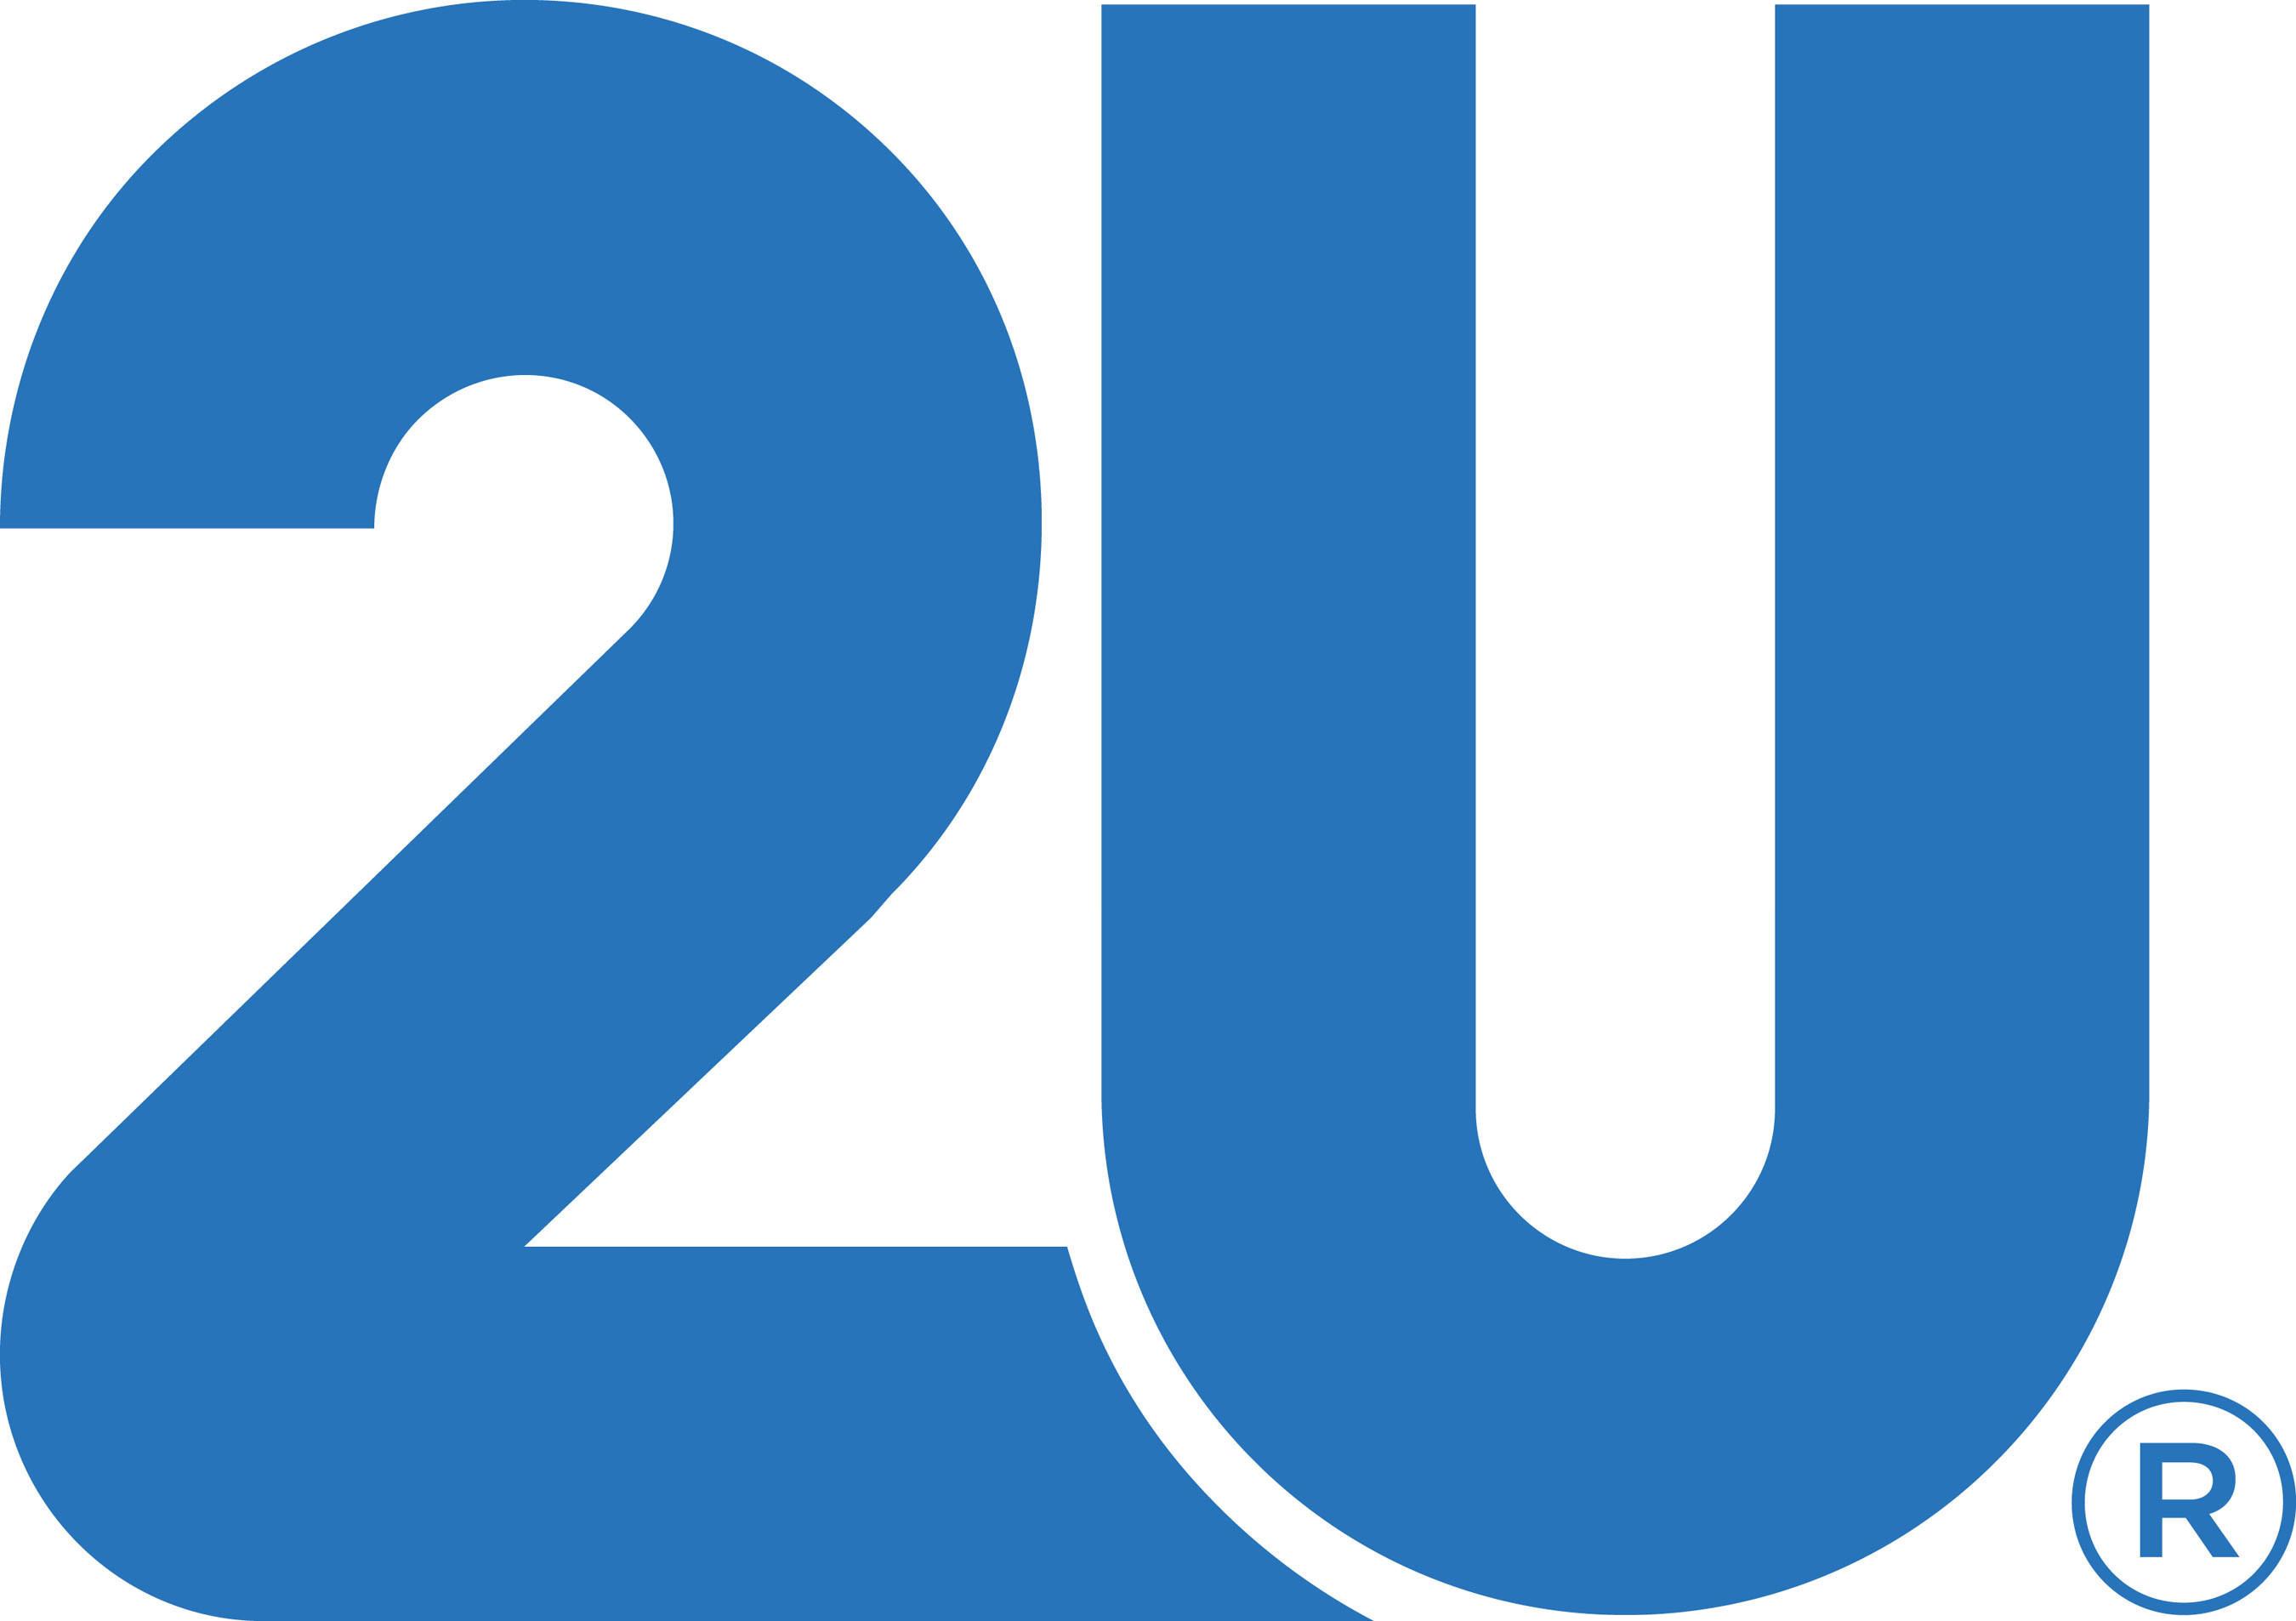 2U (NASDAQ:TWOU) Company Logo